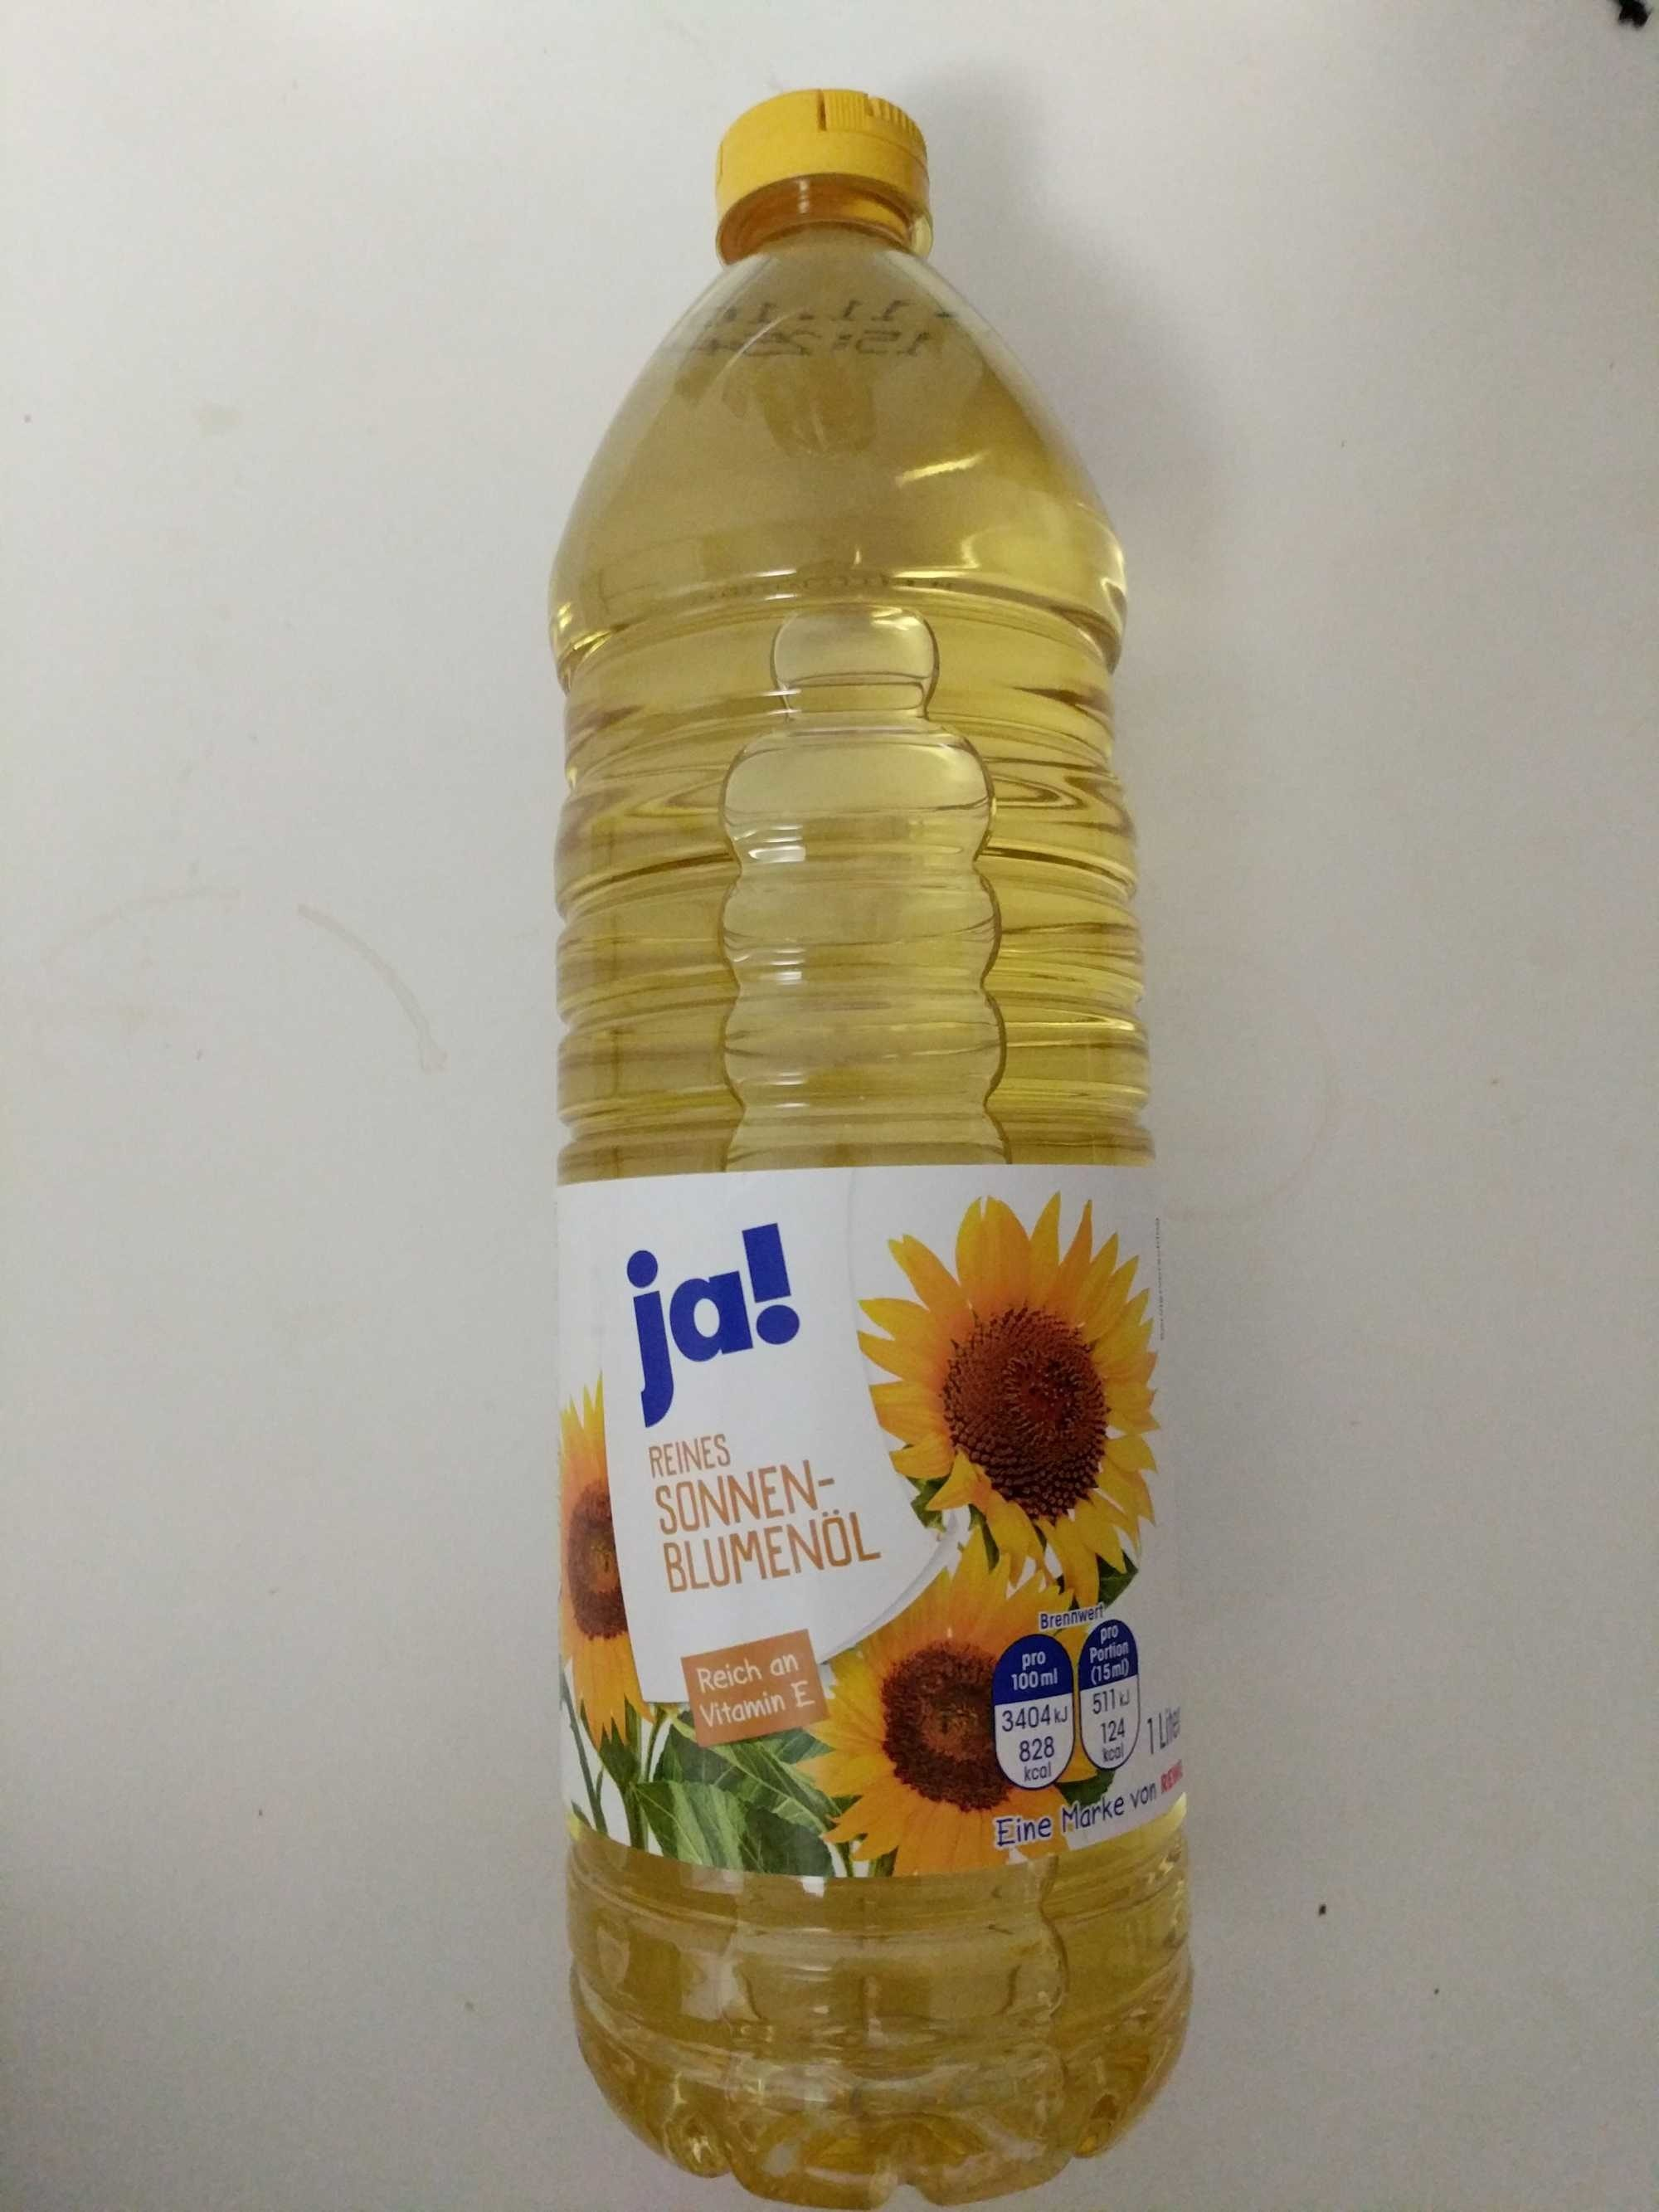 Reines Sonnenblumenöl - Product - en